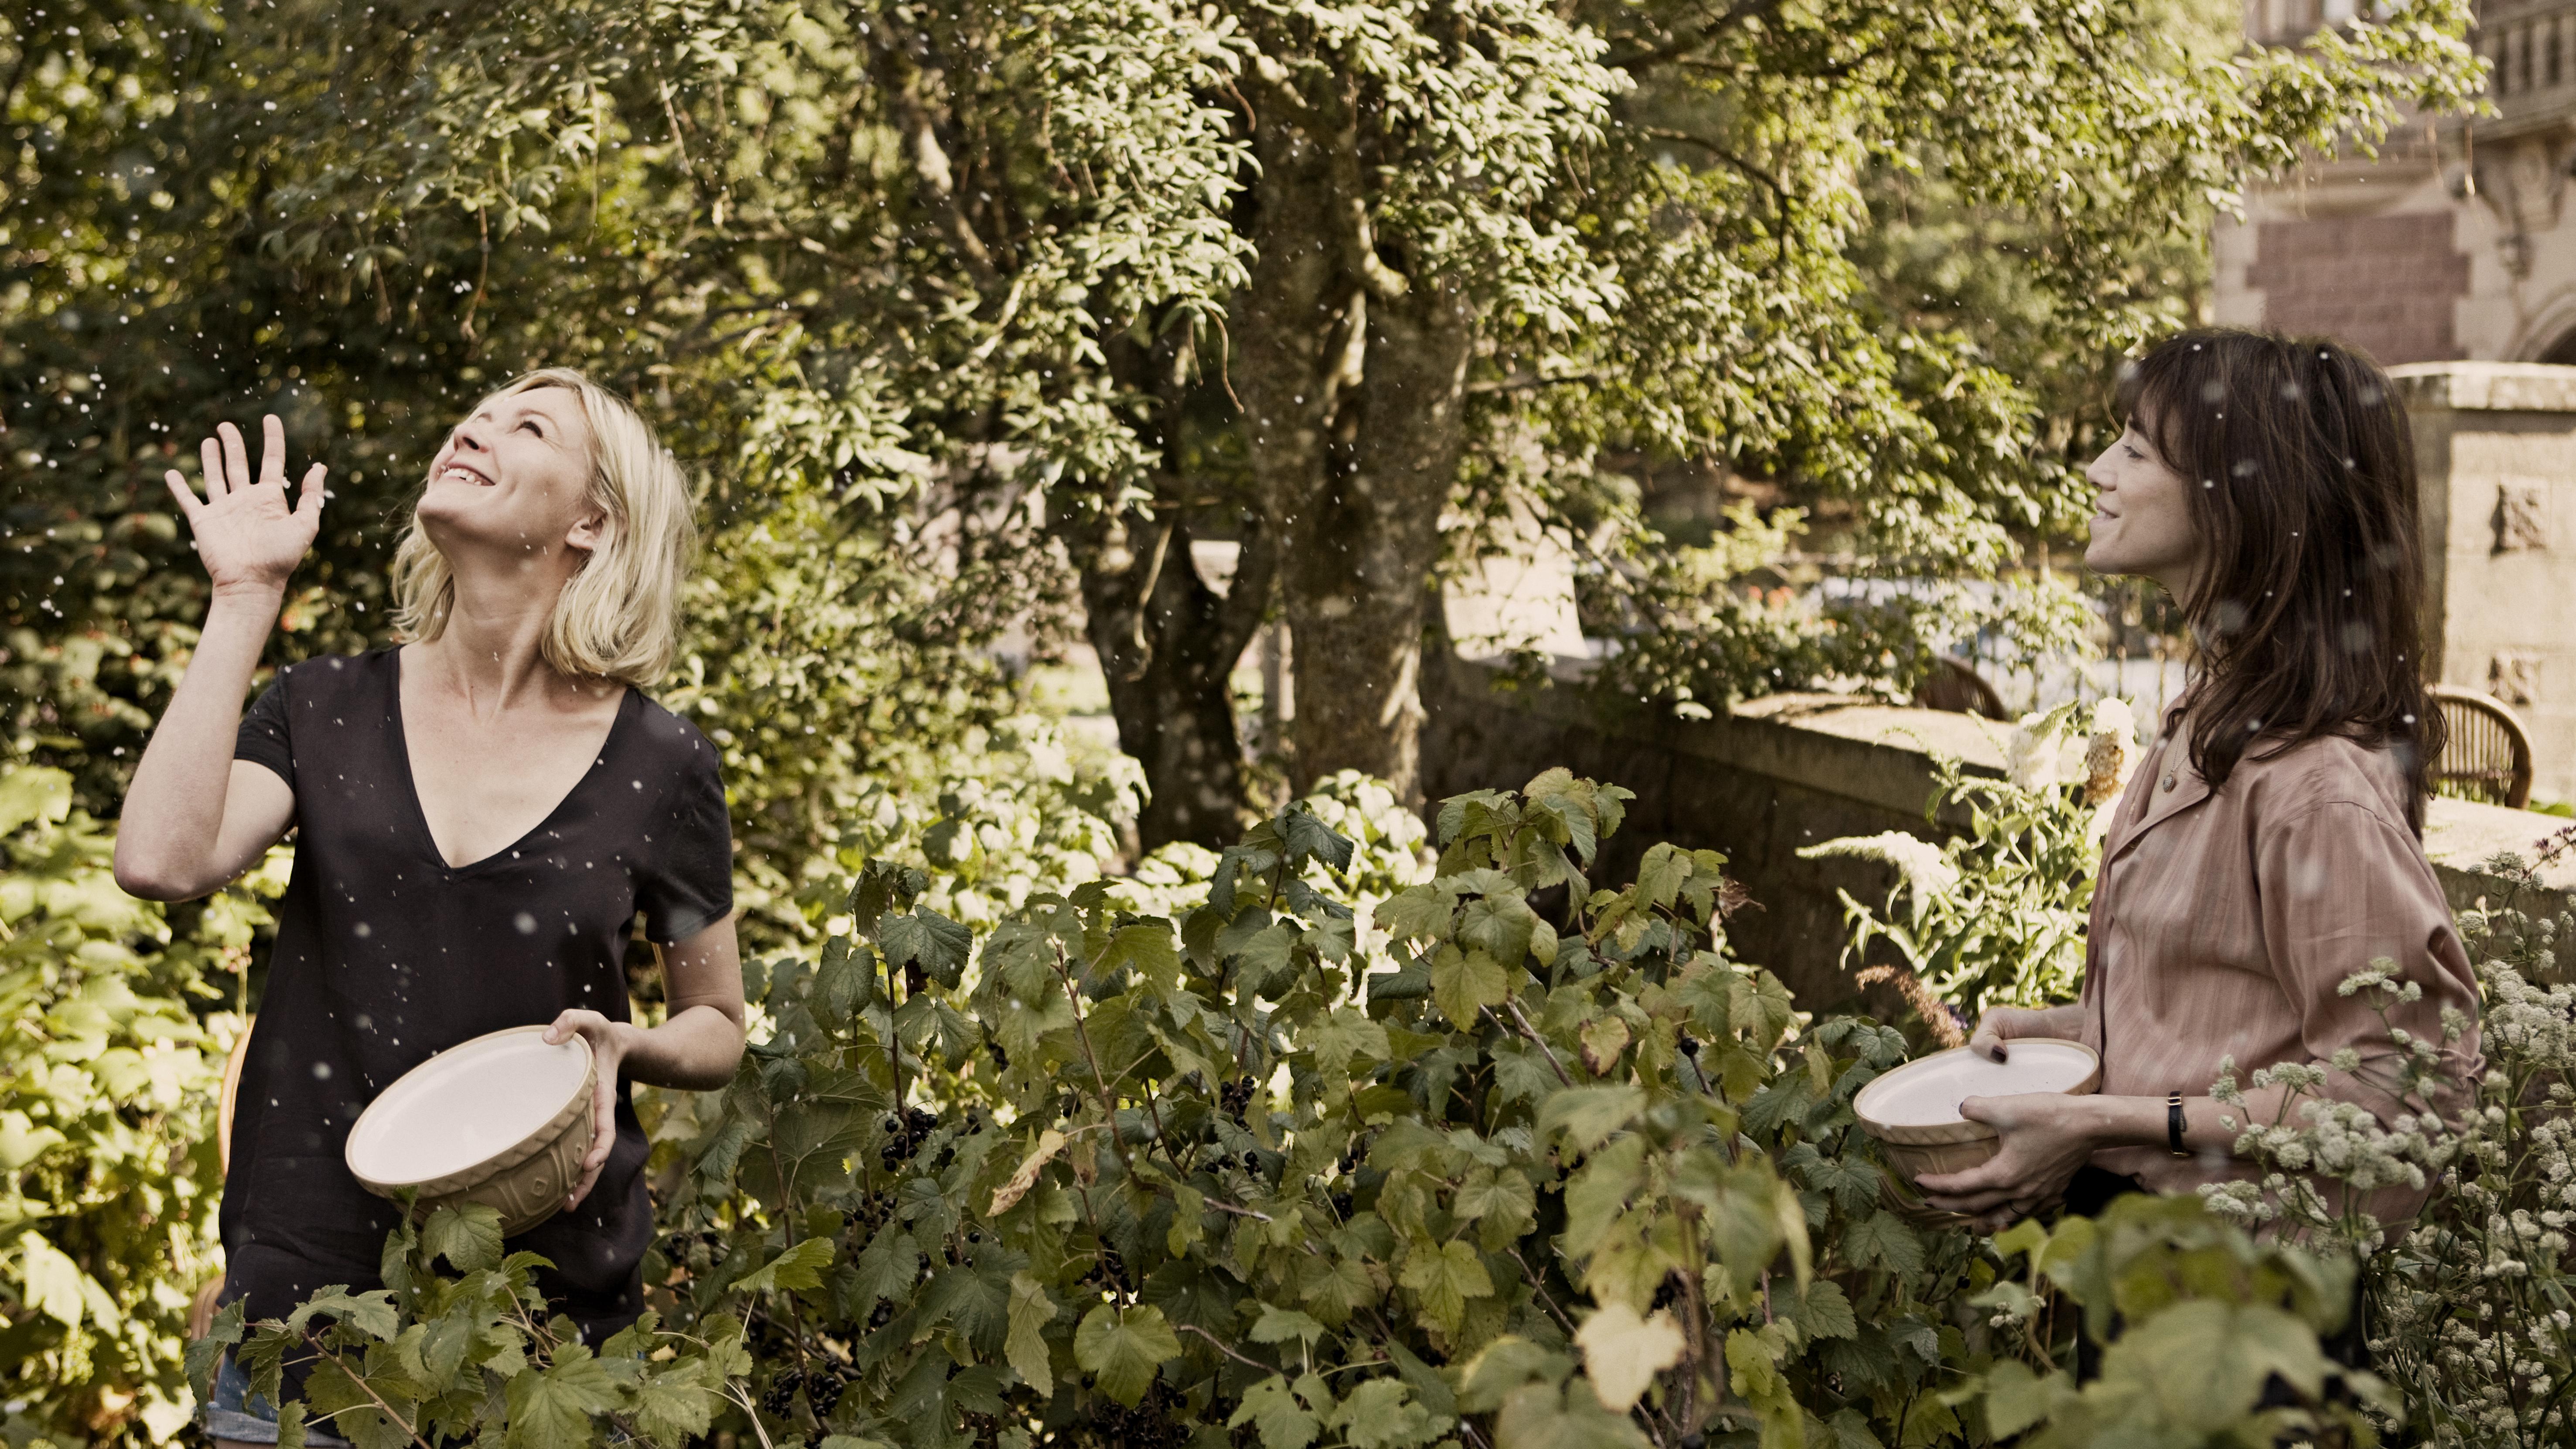 Kirsten Dunst et Charlotte Gainsbourg dans Melancholia